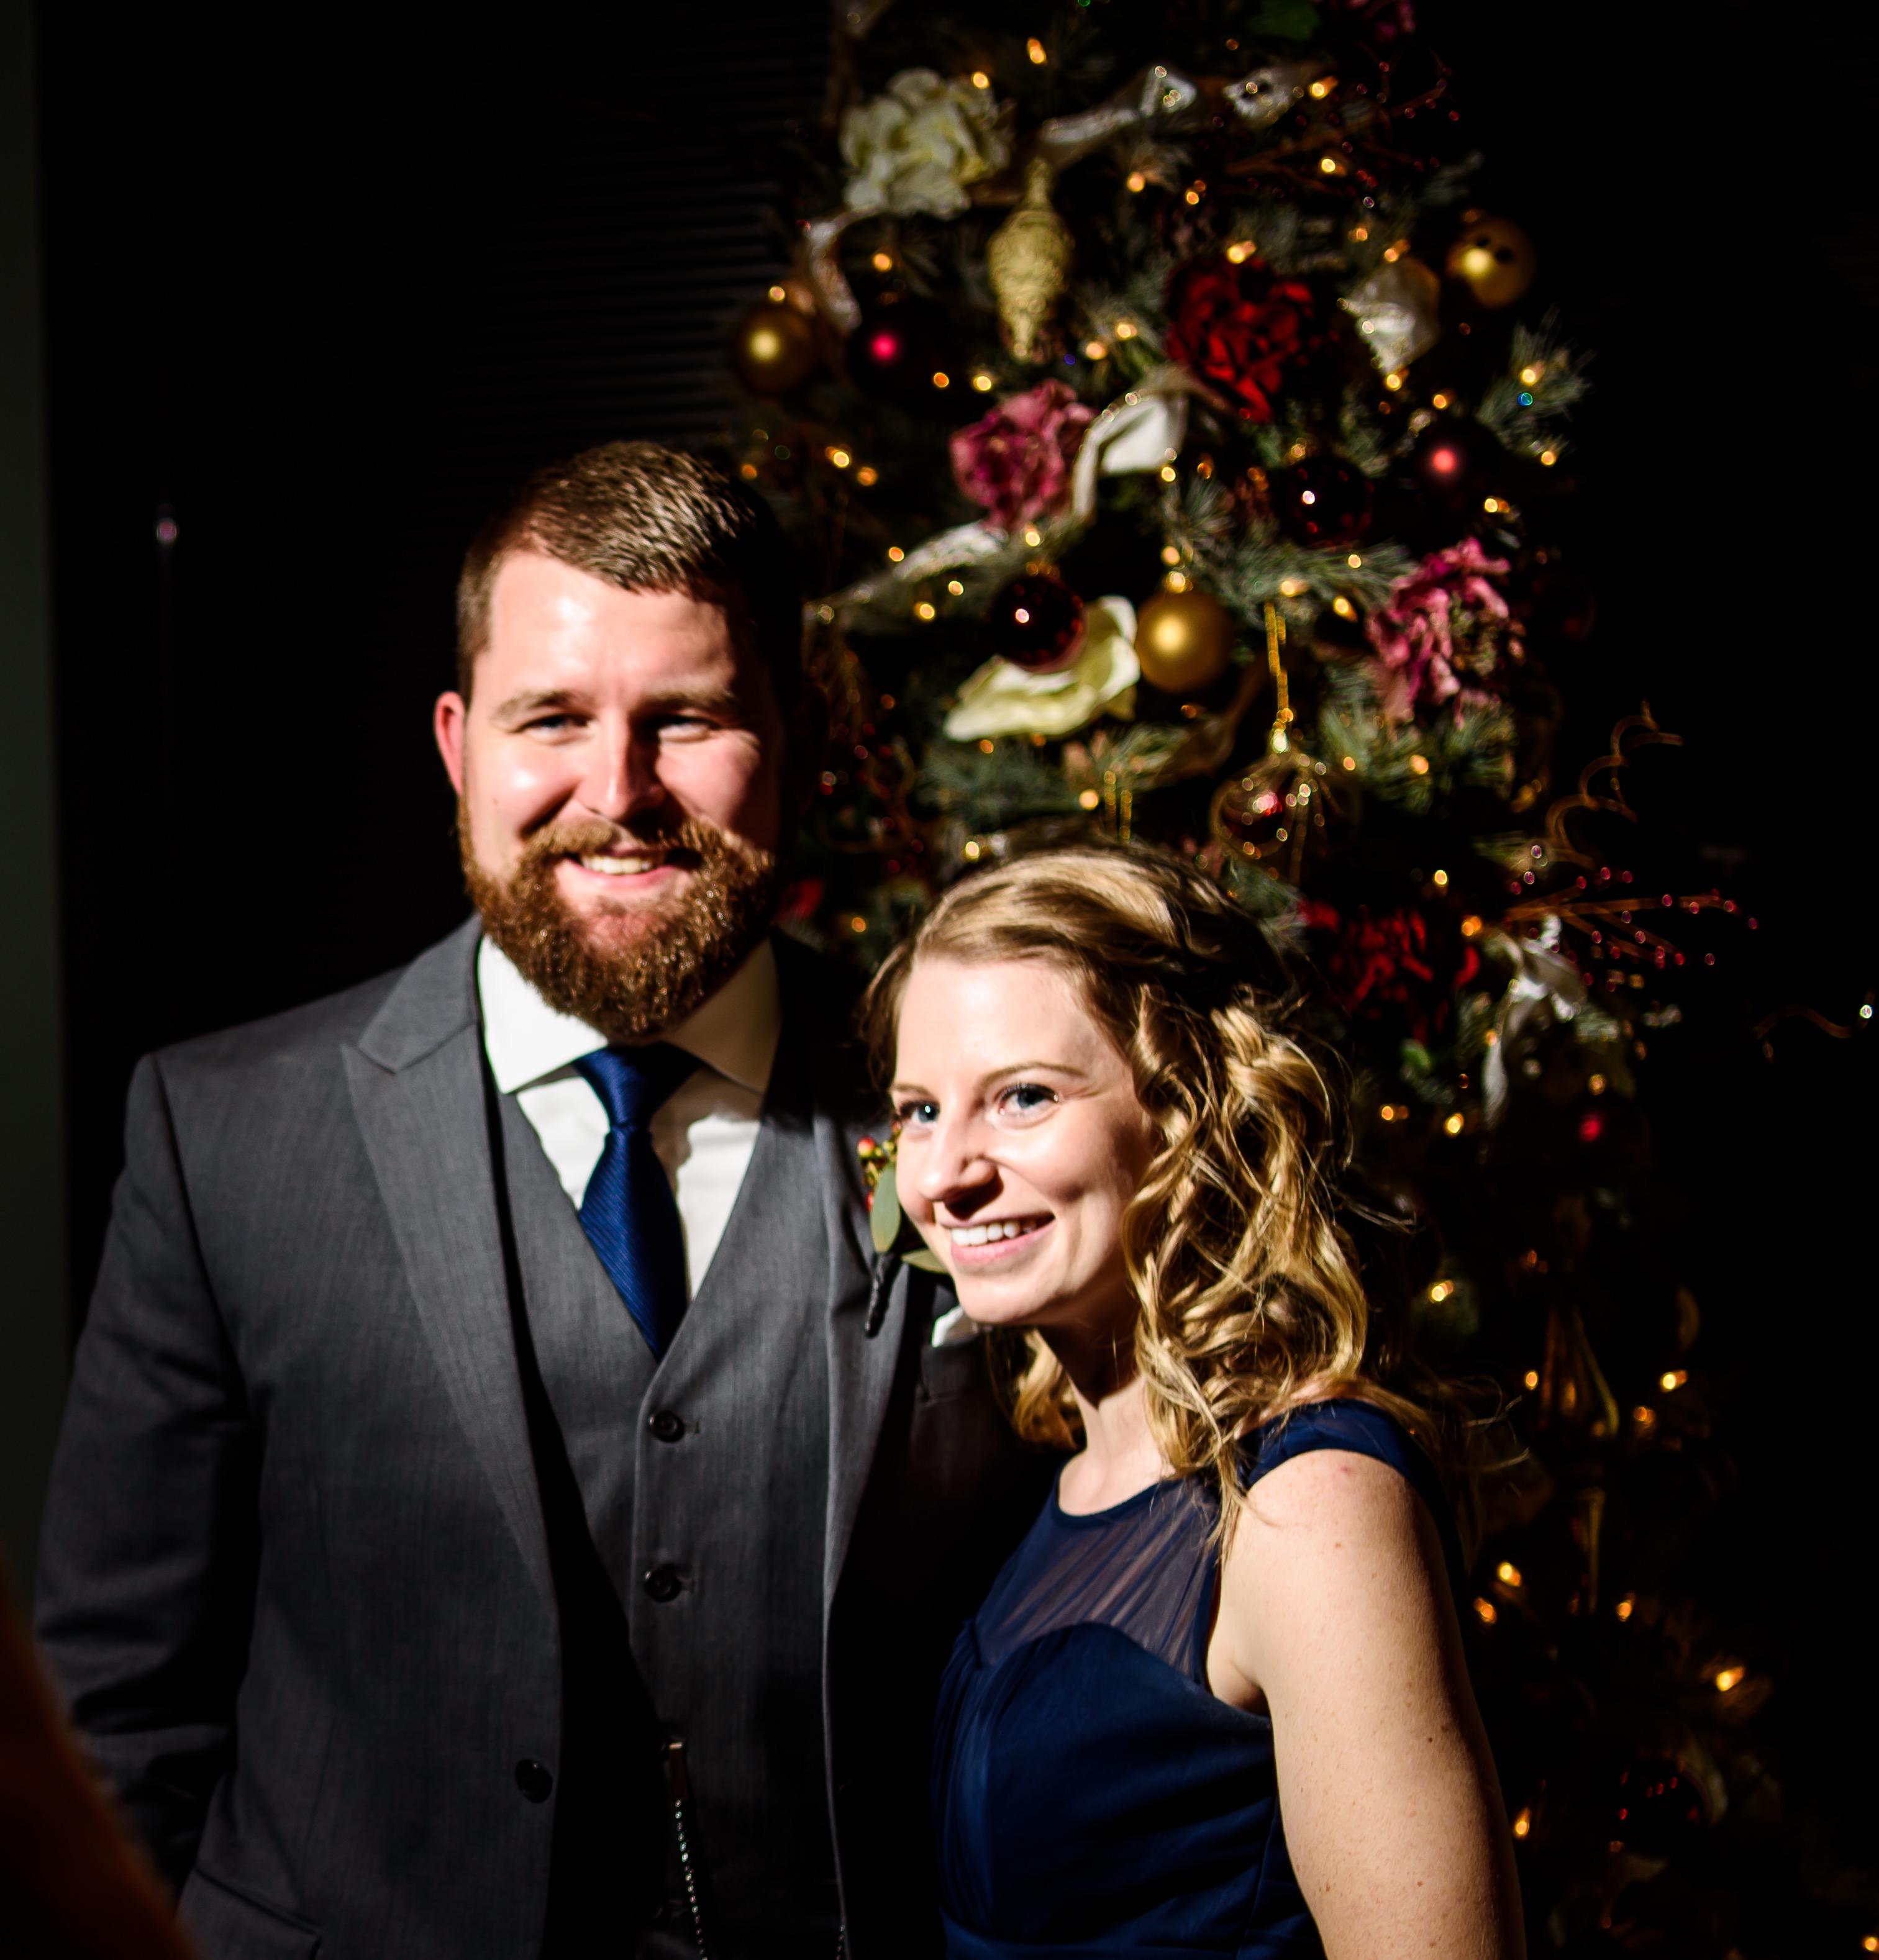 Dave and Amanda Christmas updates